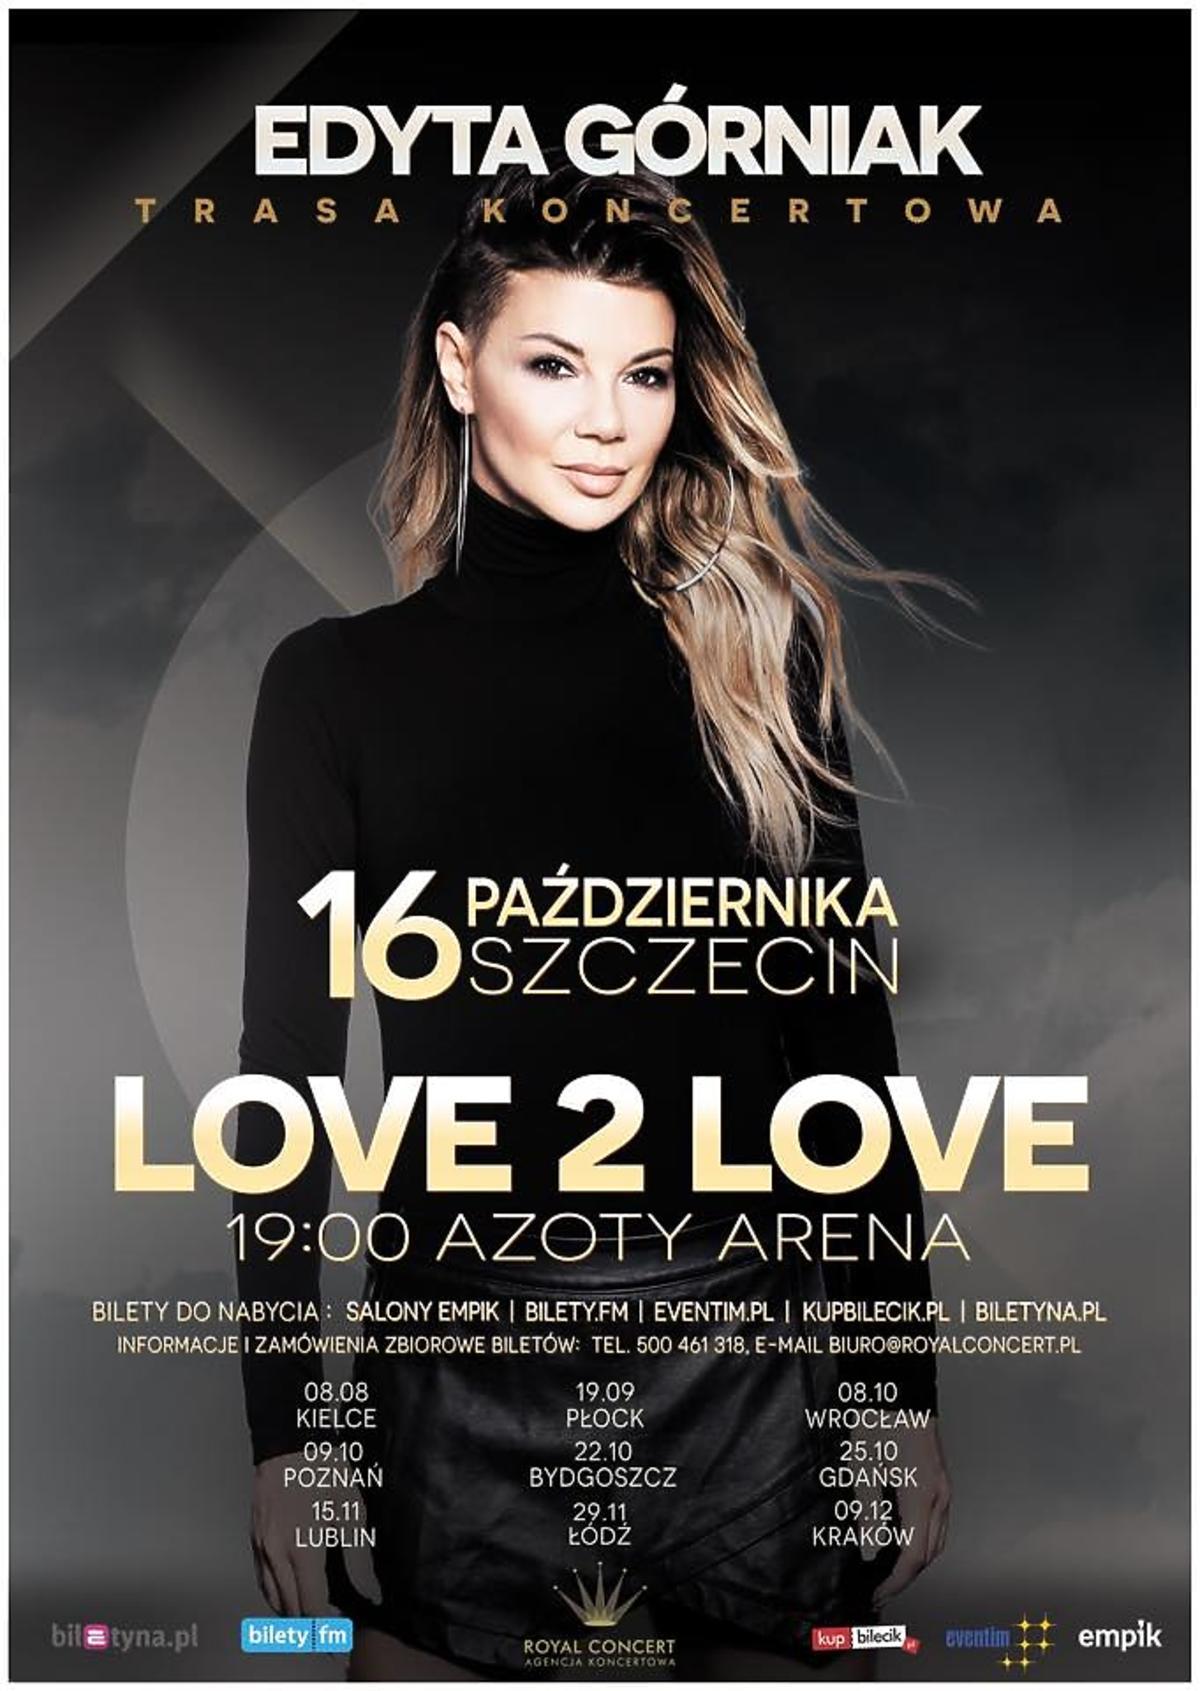 Edyta Górniak - plakat trasy koncertowej Love 2 Love